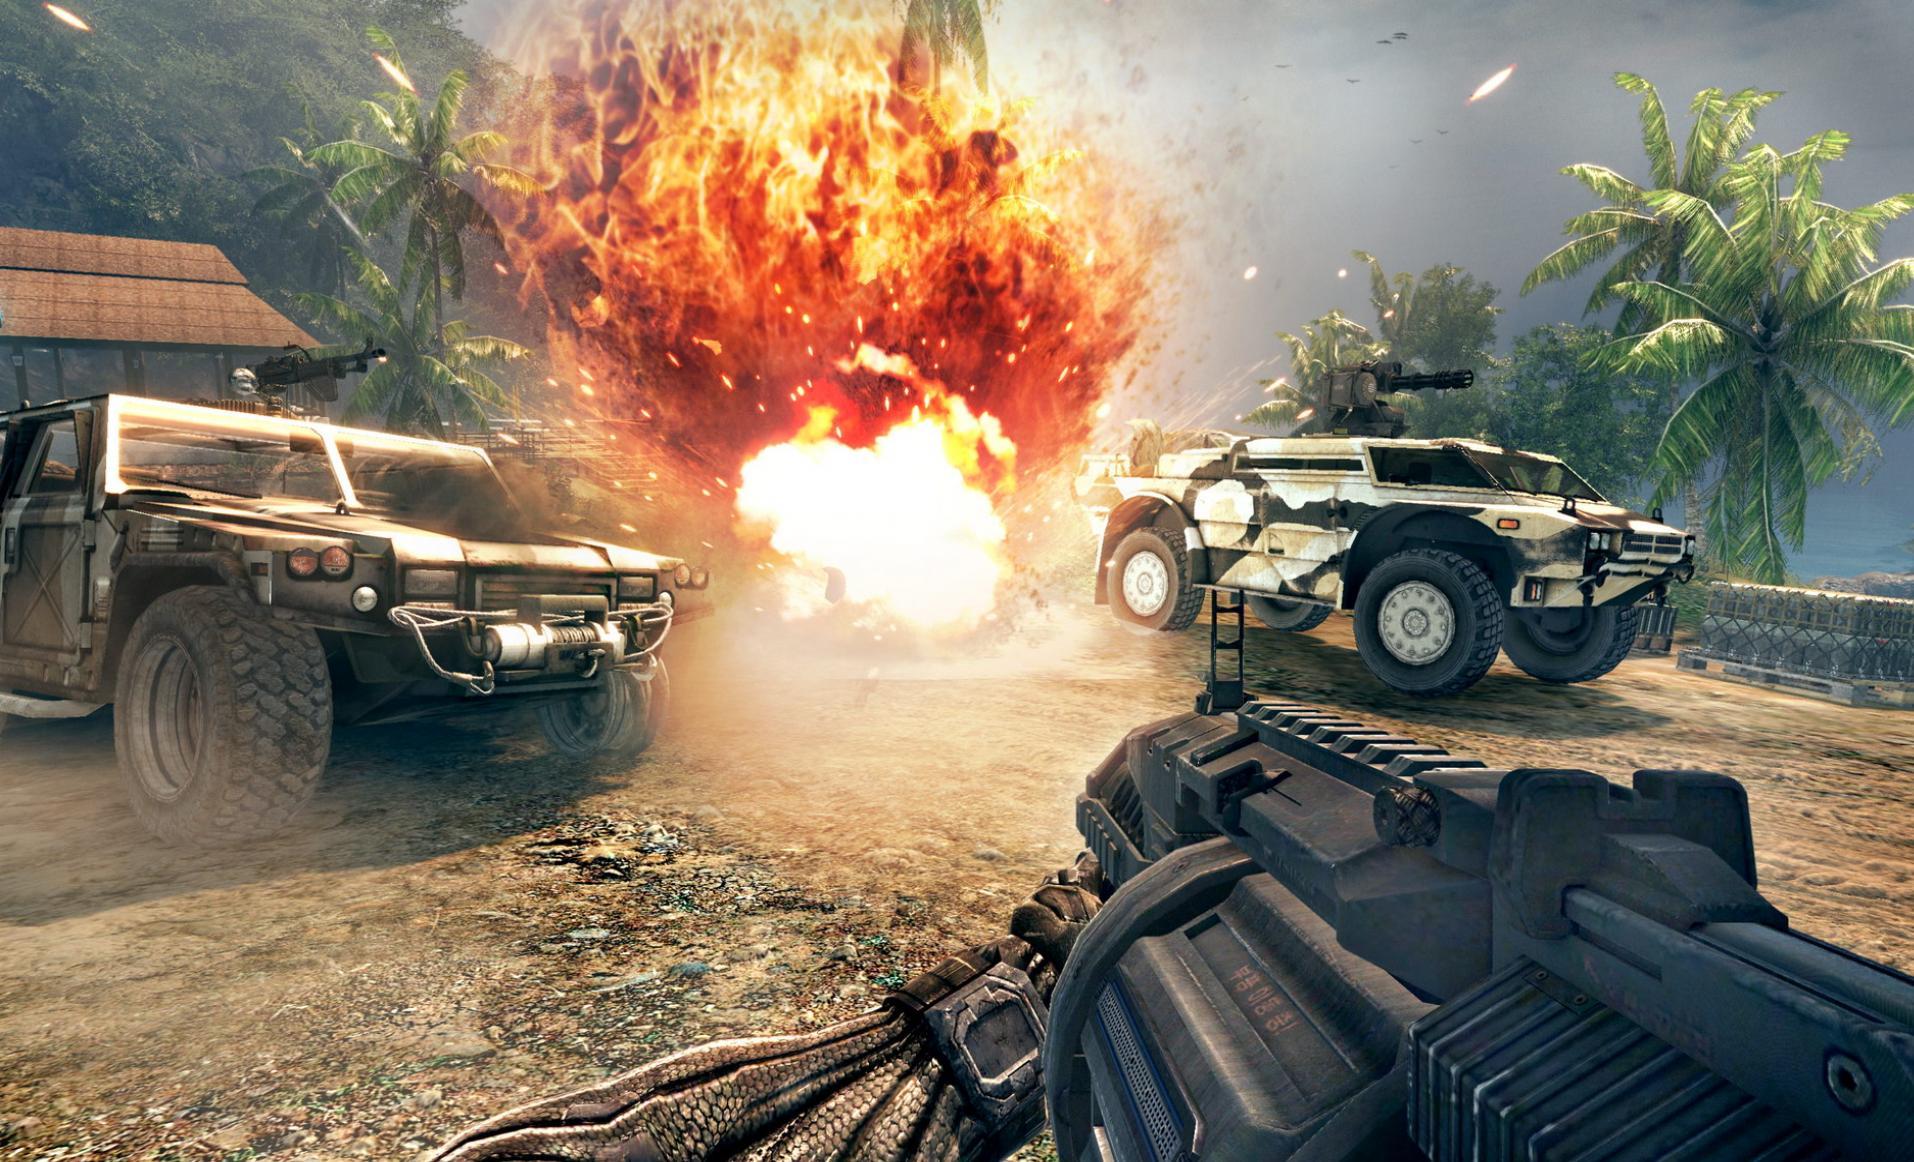 Скриншоты для игры Crysis Warhead.